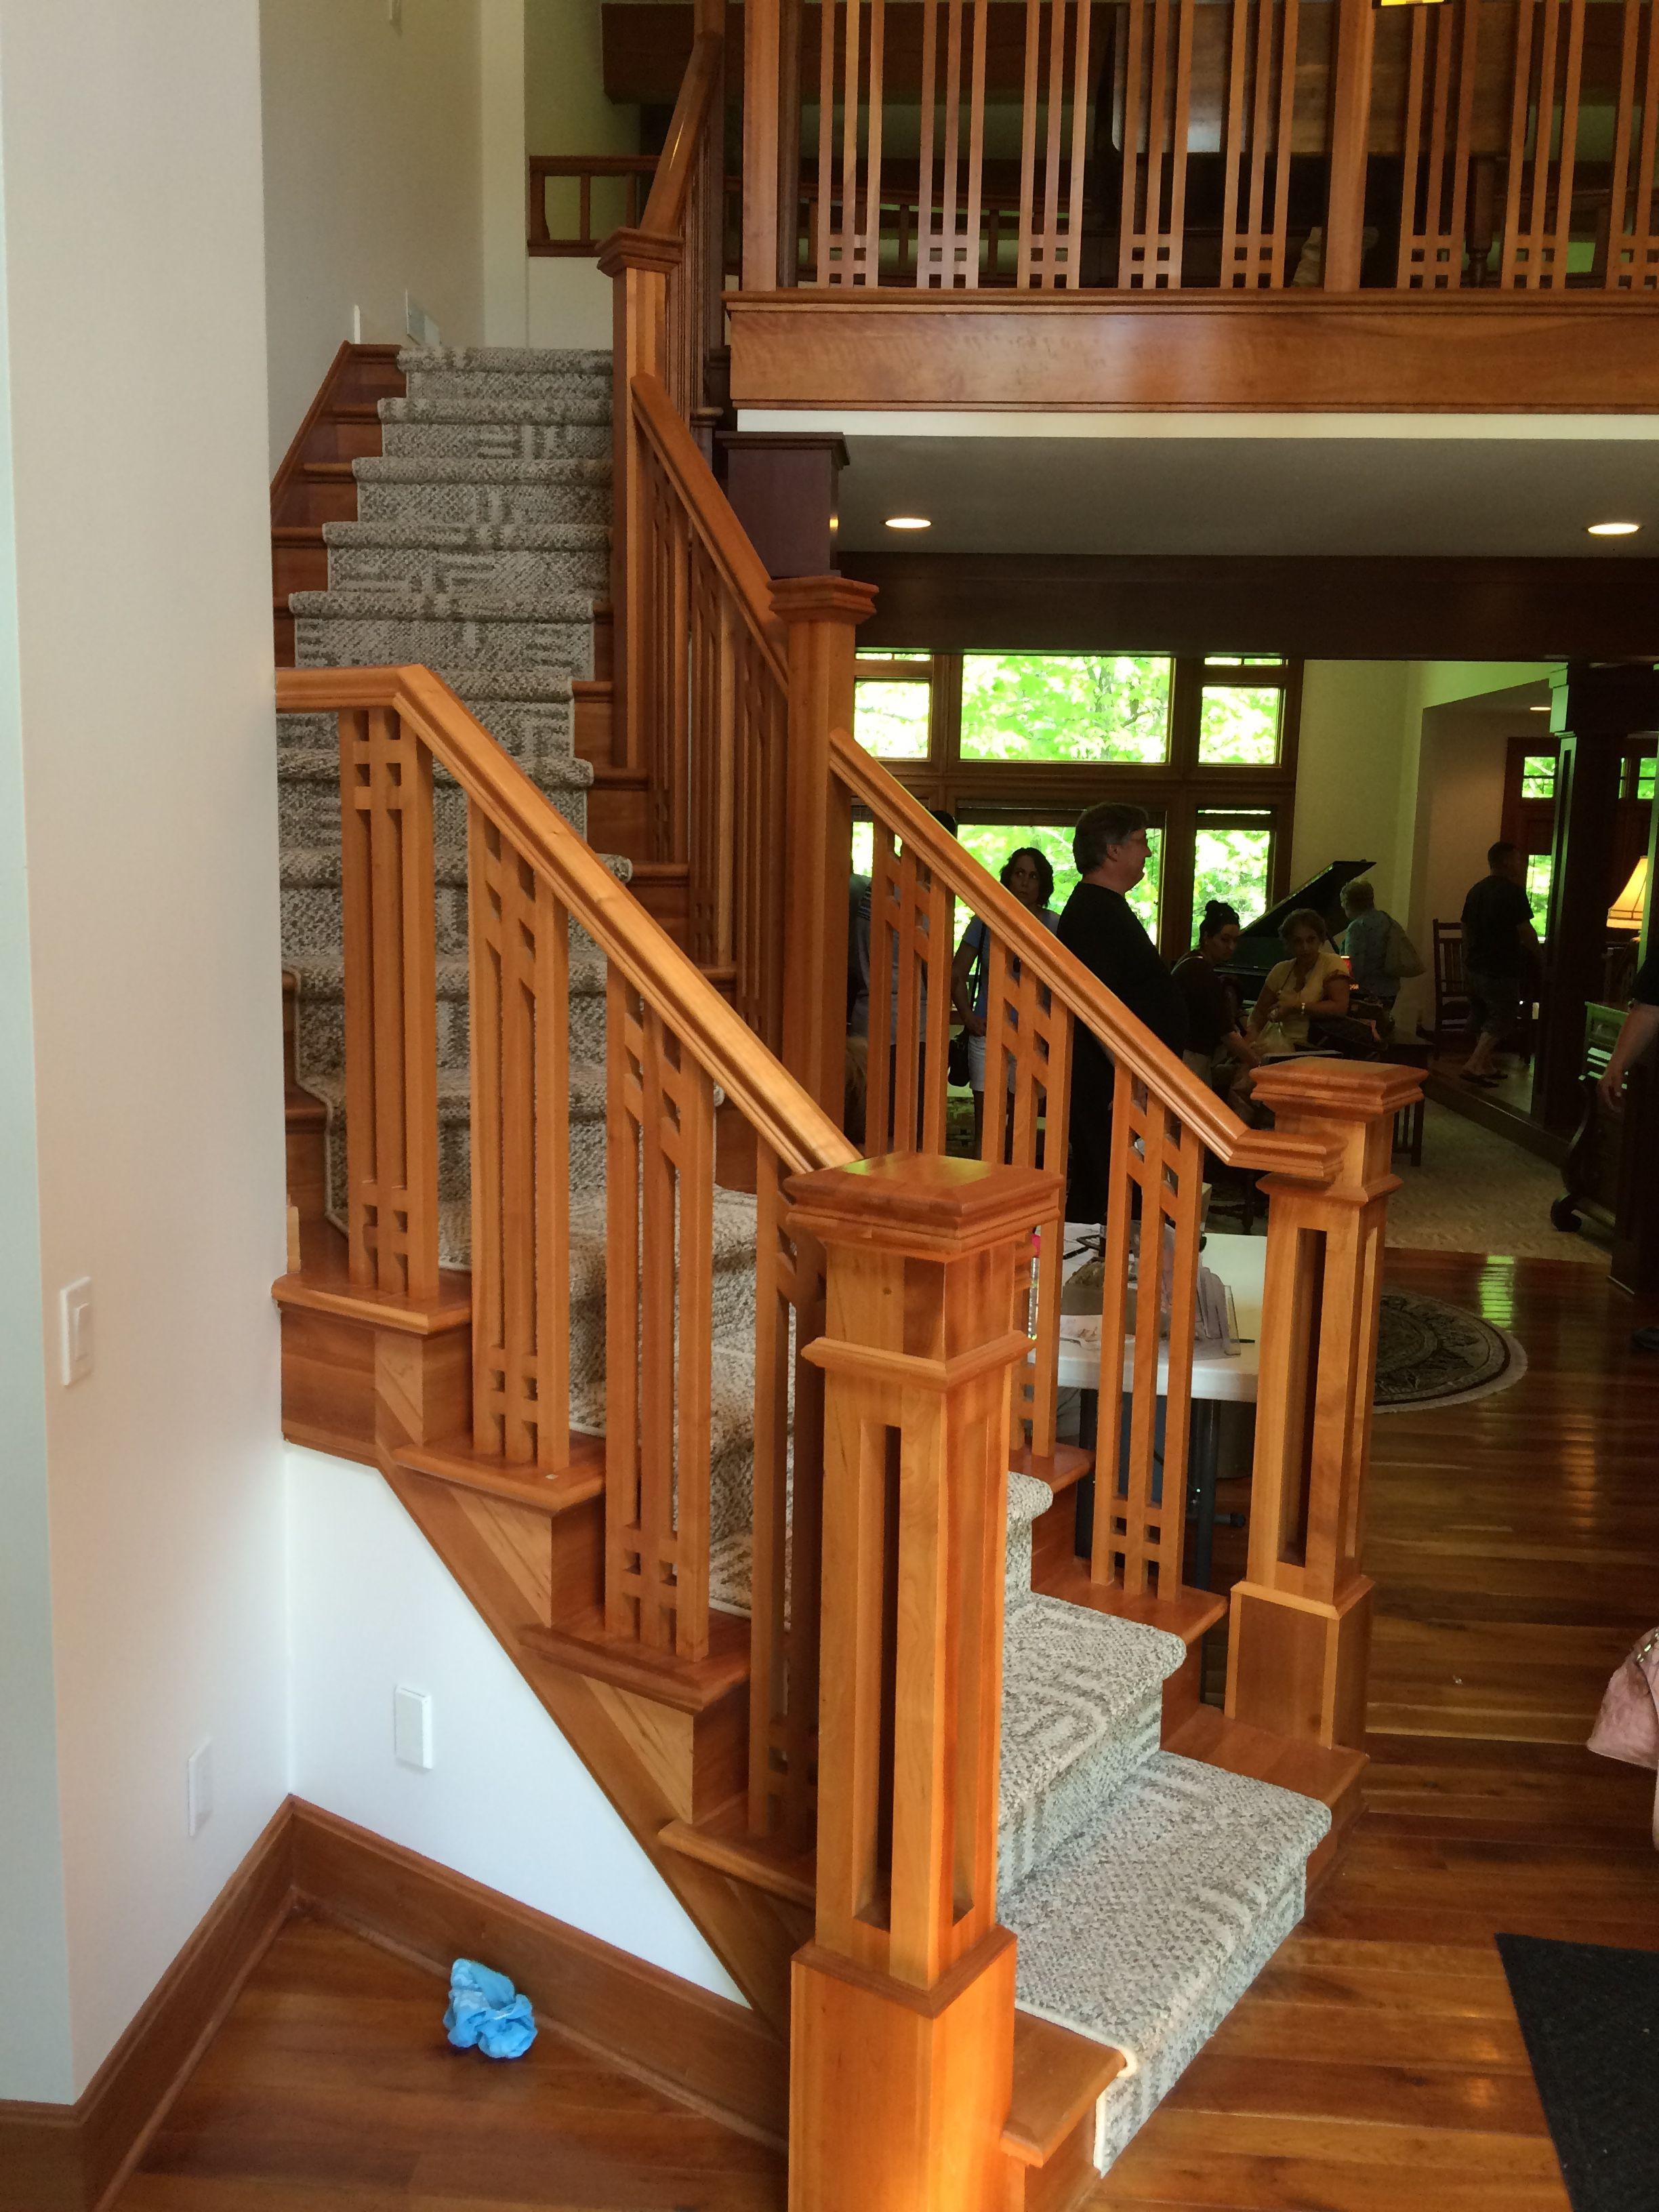 Mission Craftsman Stair Railing Design Craftsman | Craftsman Style Stair Railing